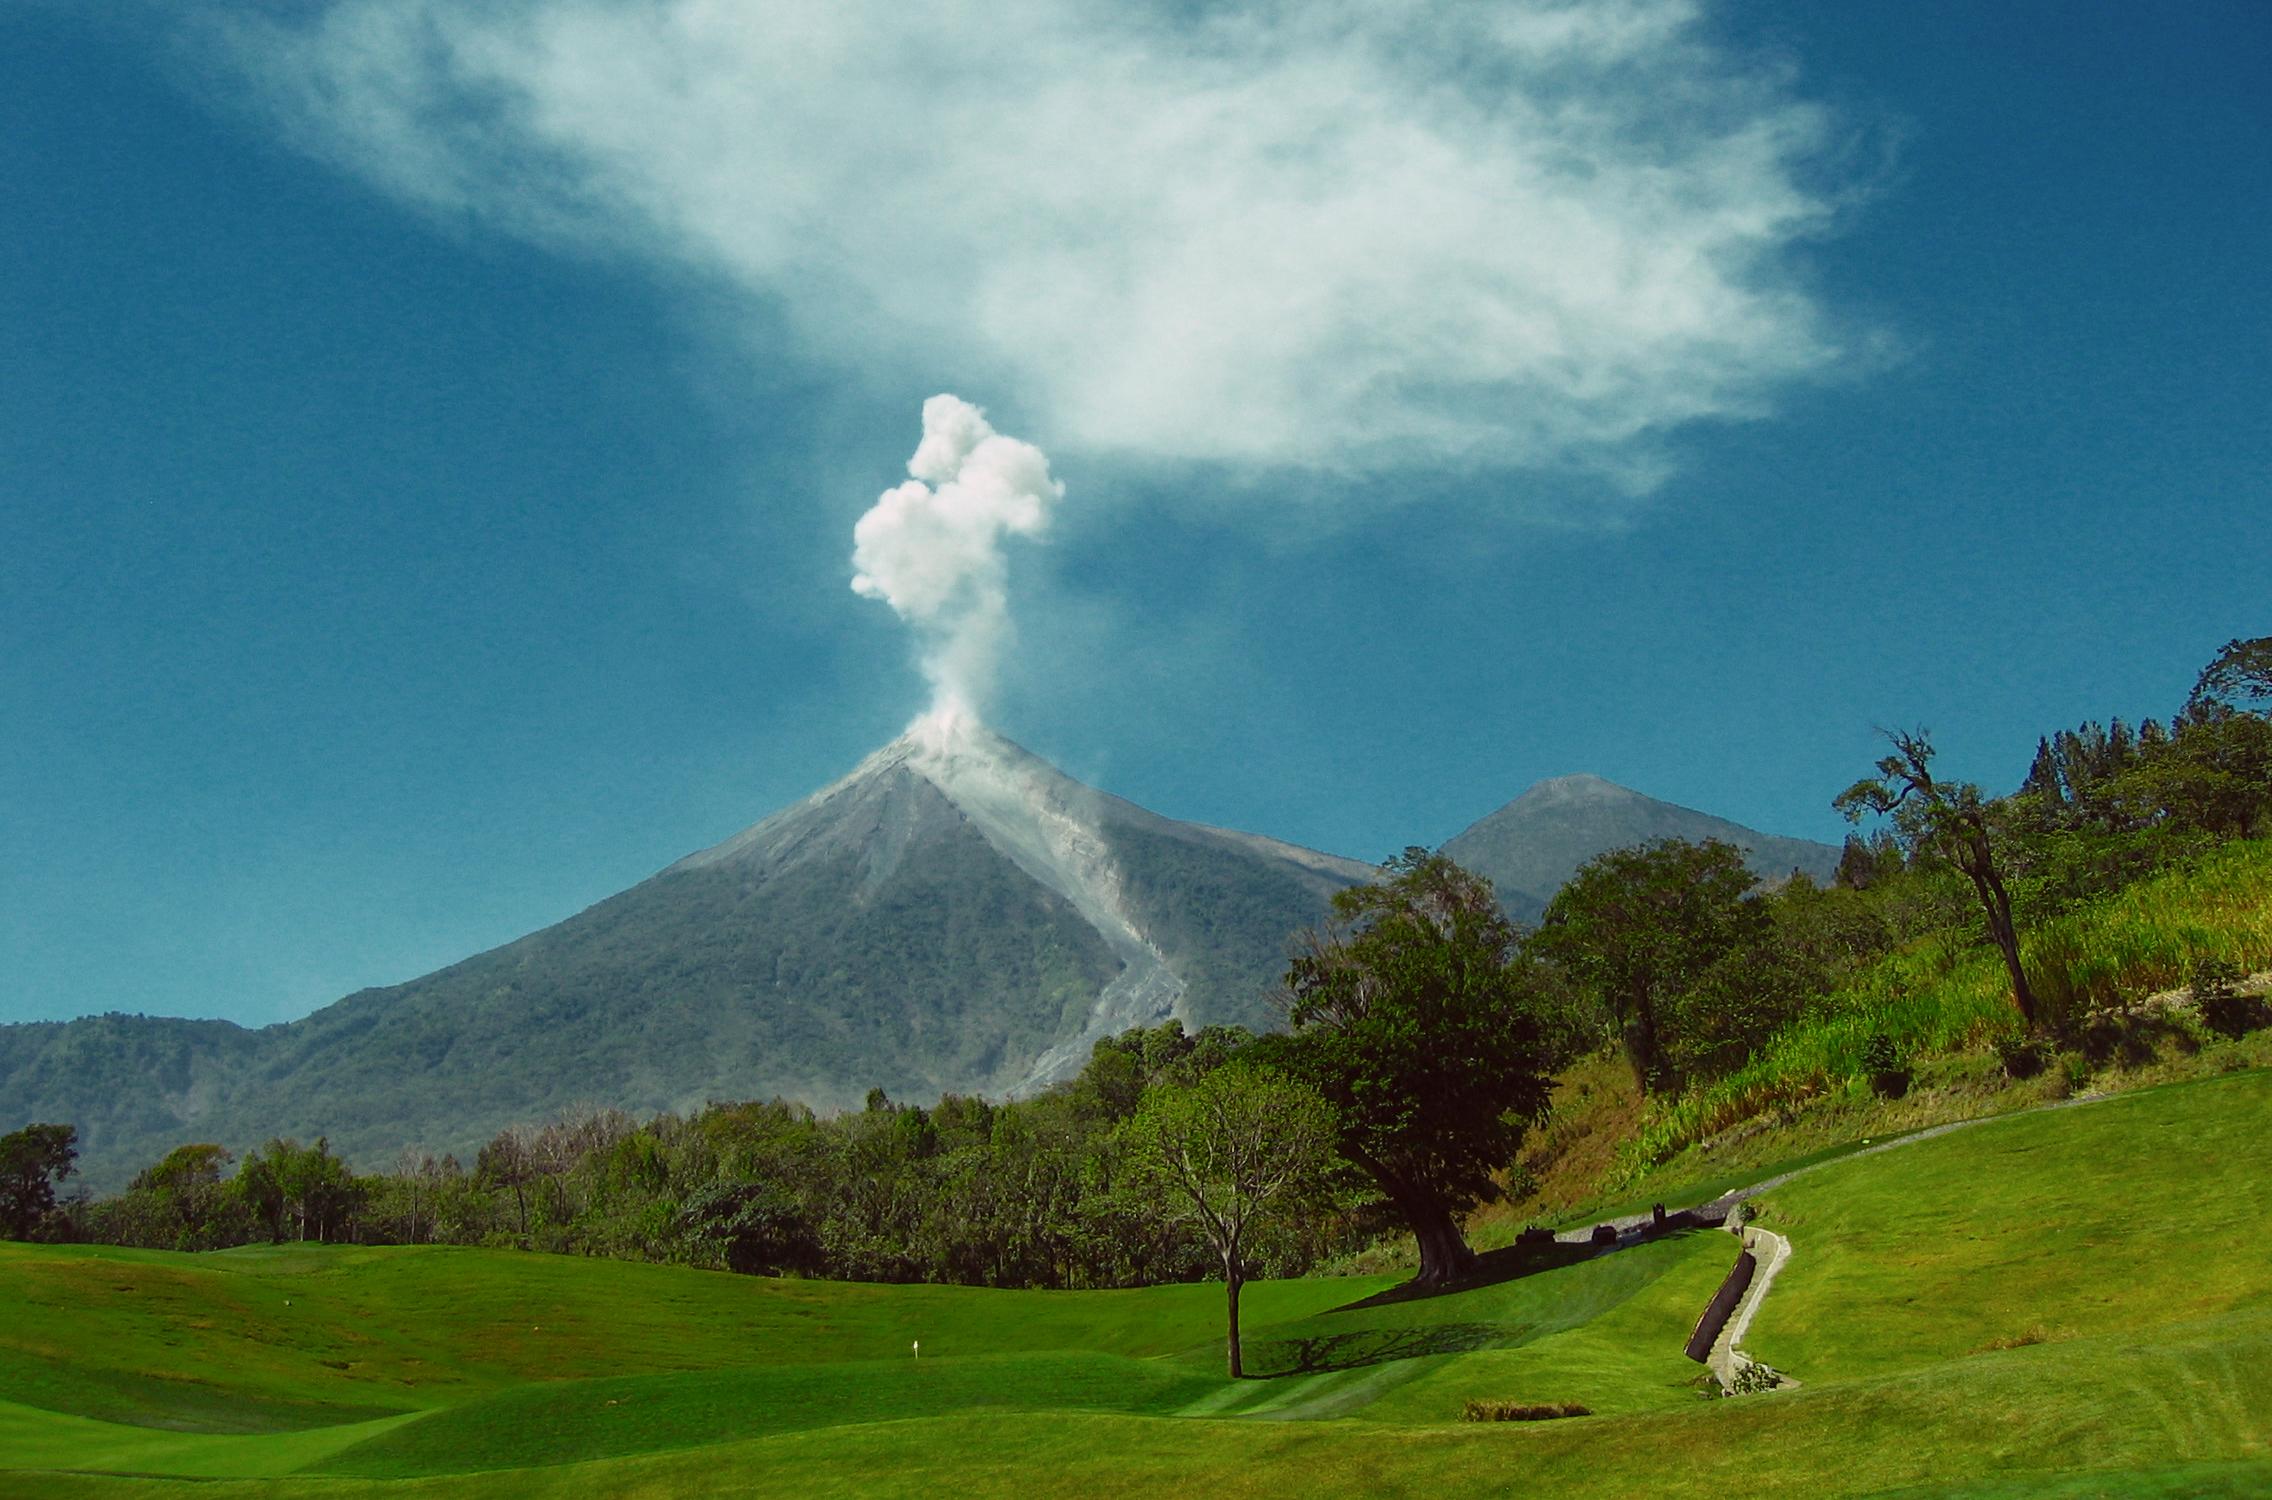 God's power on the mountain